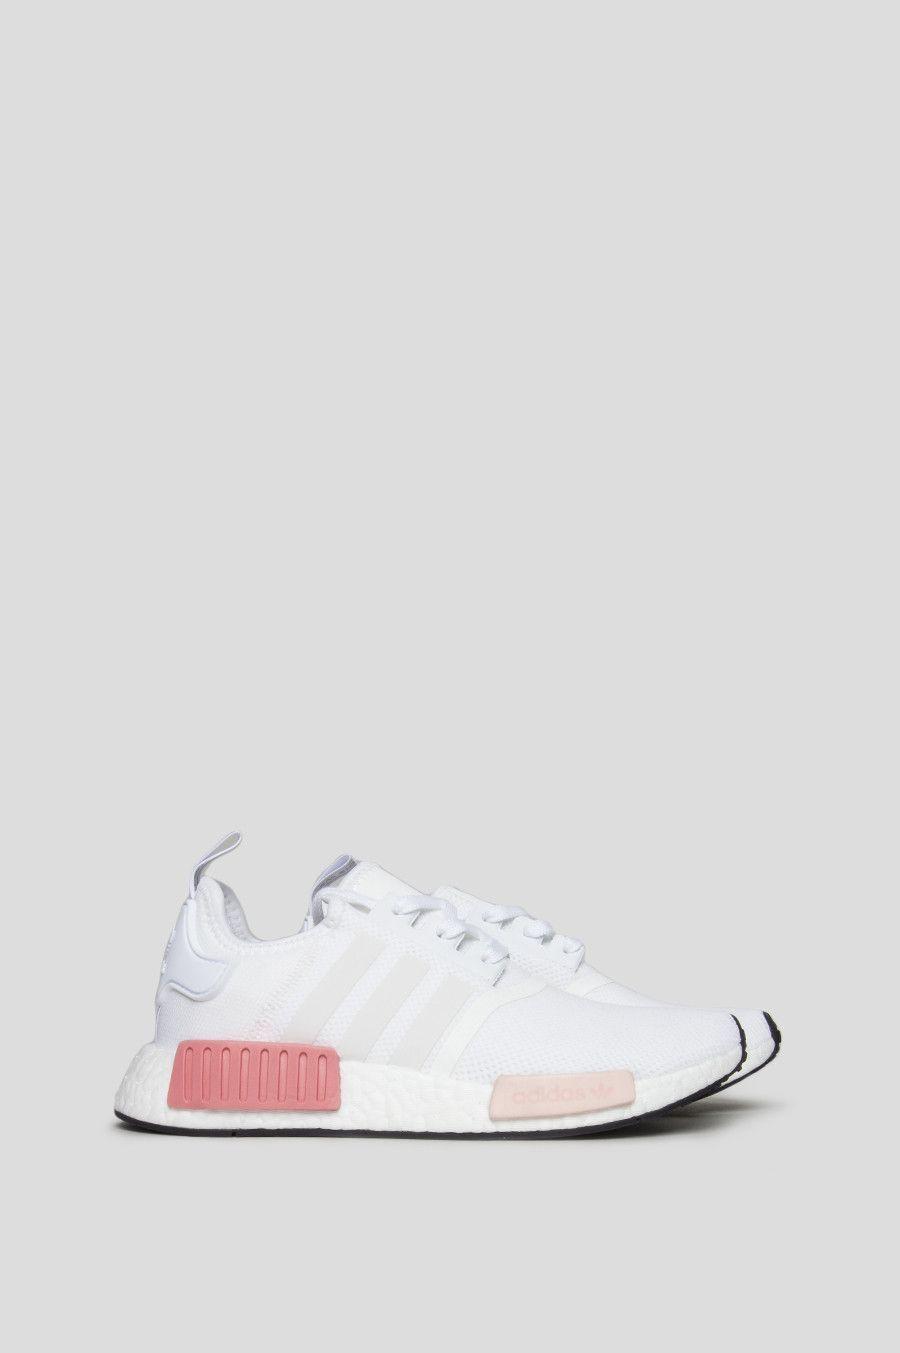 Adidas donne nmd r1 bianco rosa scarpe pinterest nmd r1, nmd